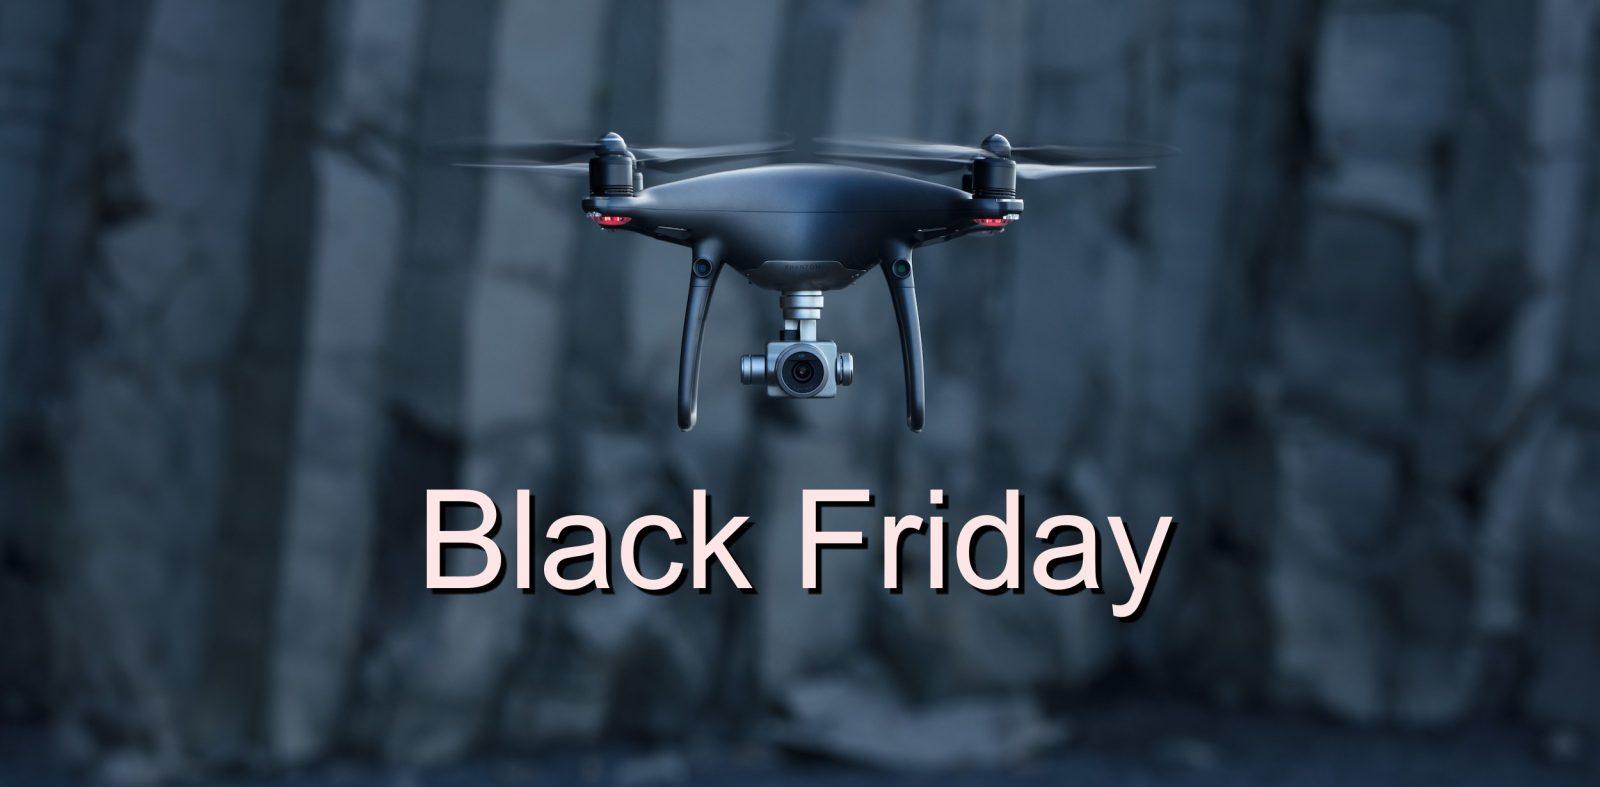 6b07f7b1fee DJI reveals Black Friday 2017 discounts – Spark, Mavic Pro, Goggles, Osmo,  more